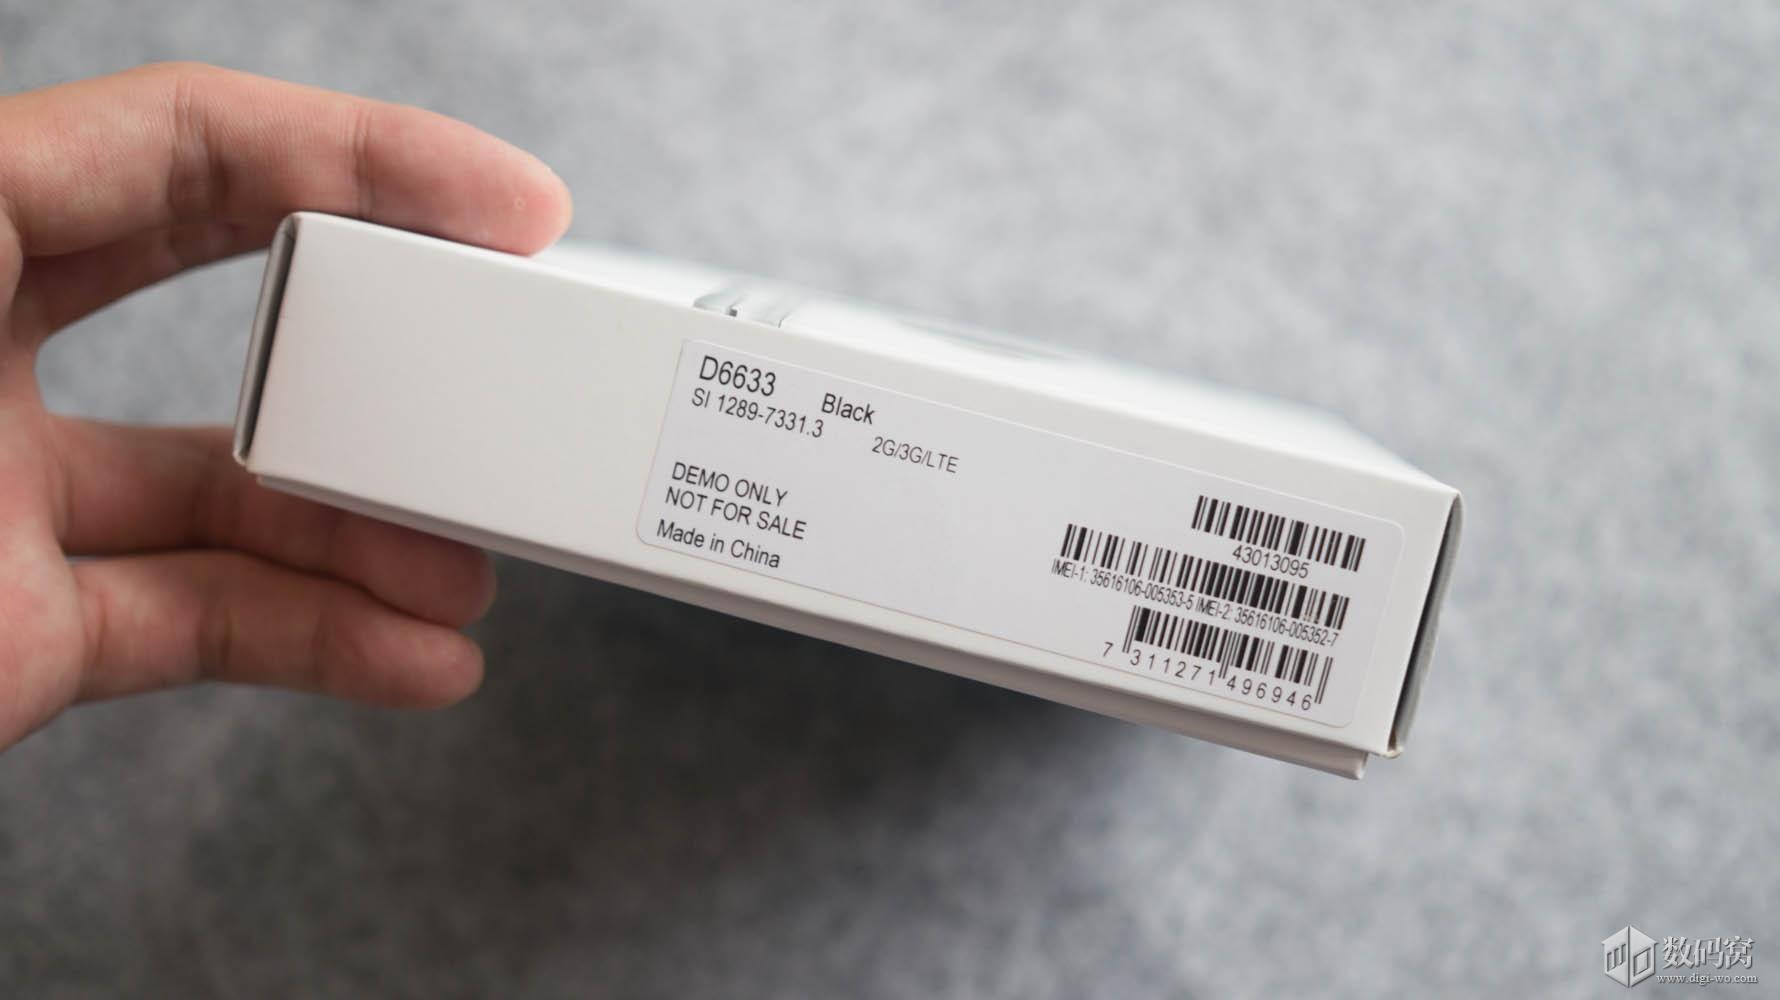 Xperia Z3 Dual D6633 SIM status